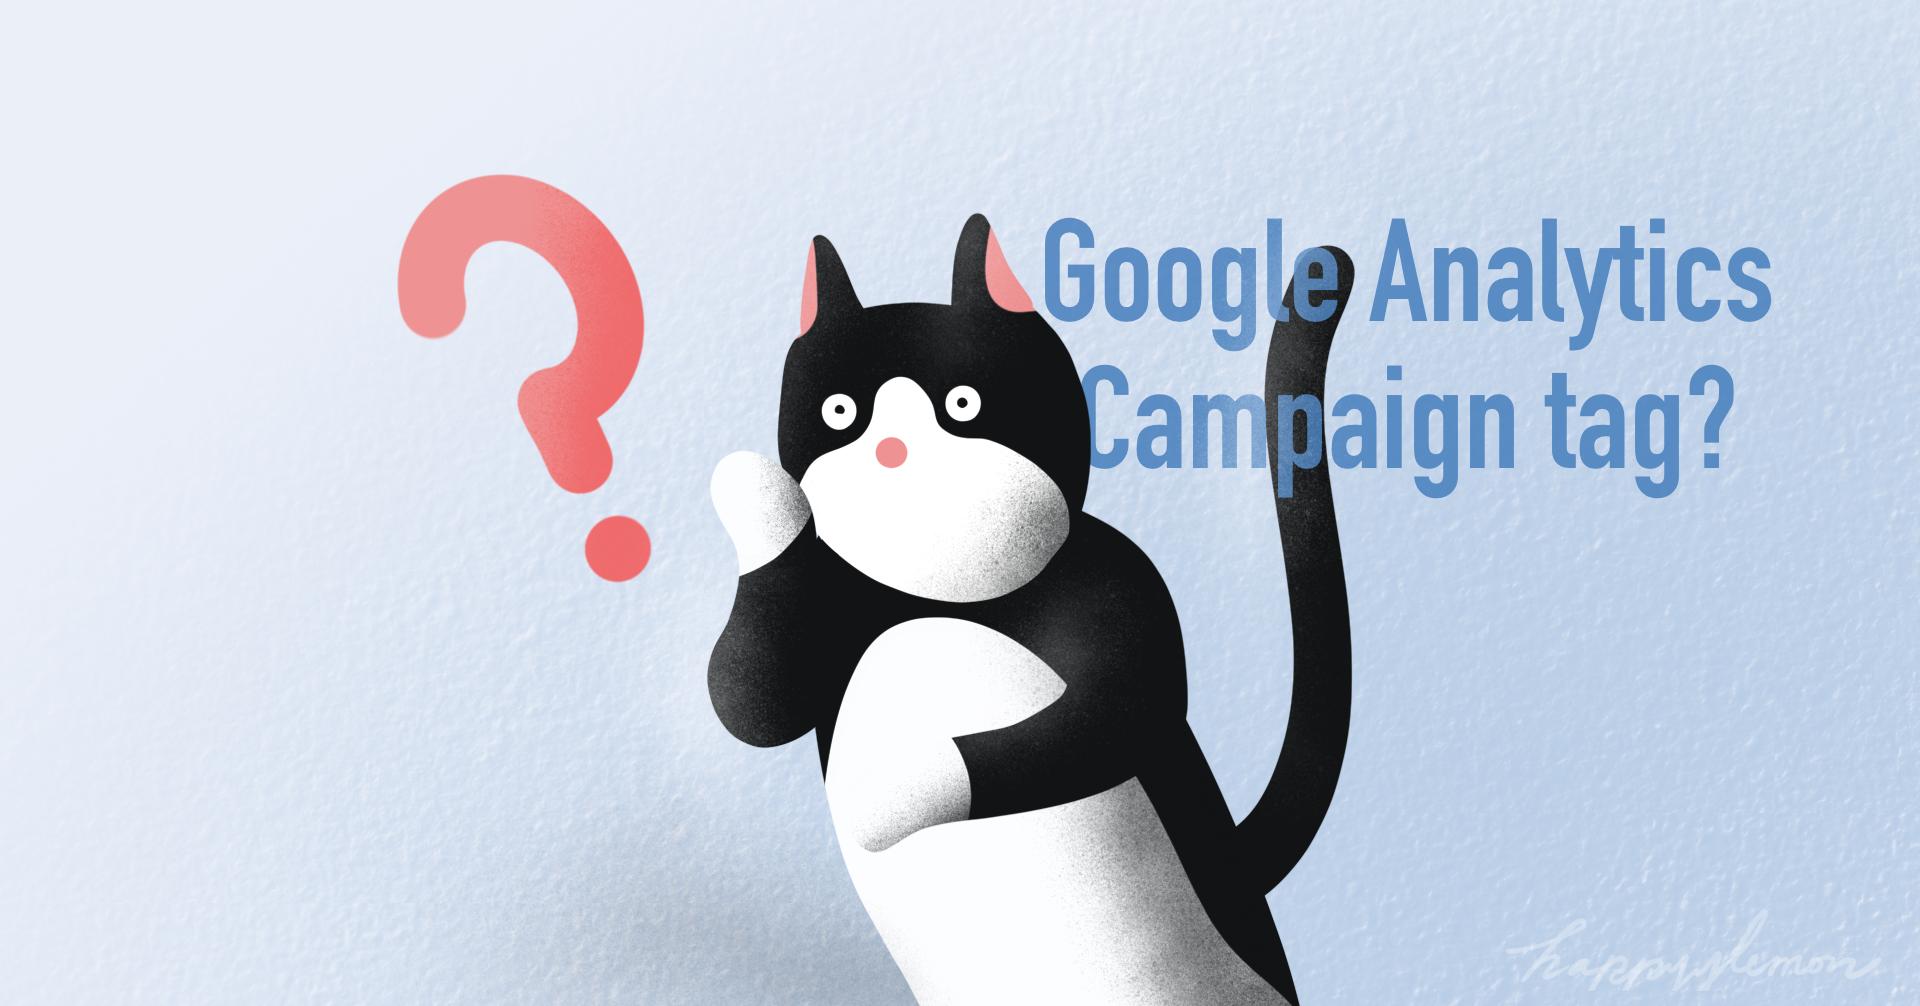 googleAnalyticsCampaignTag